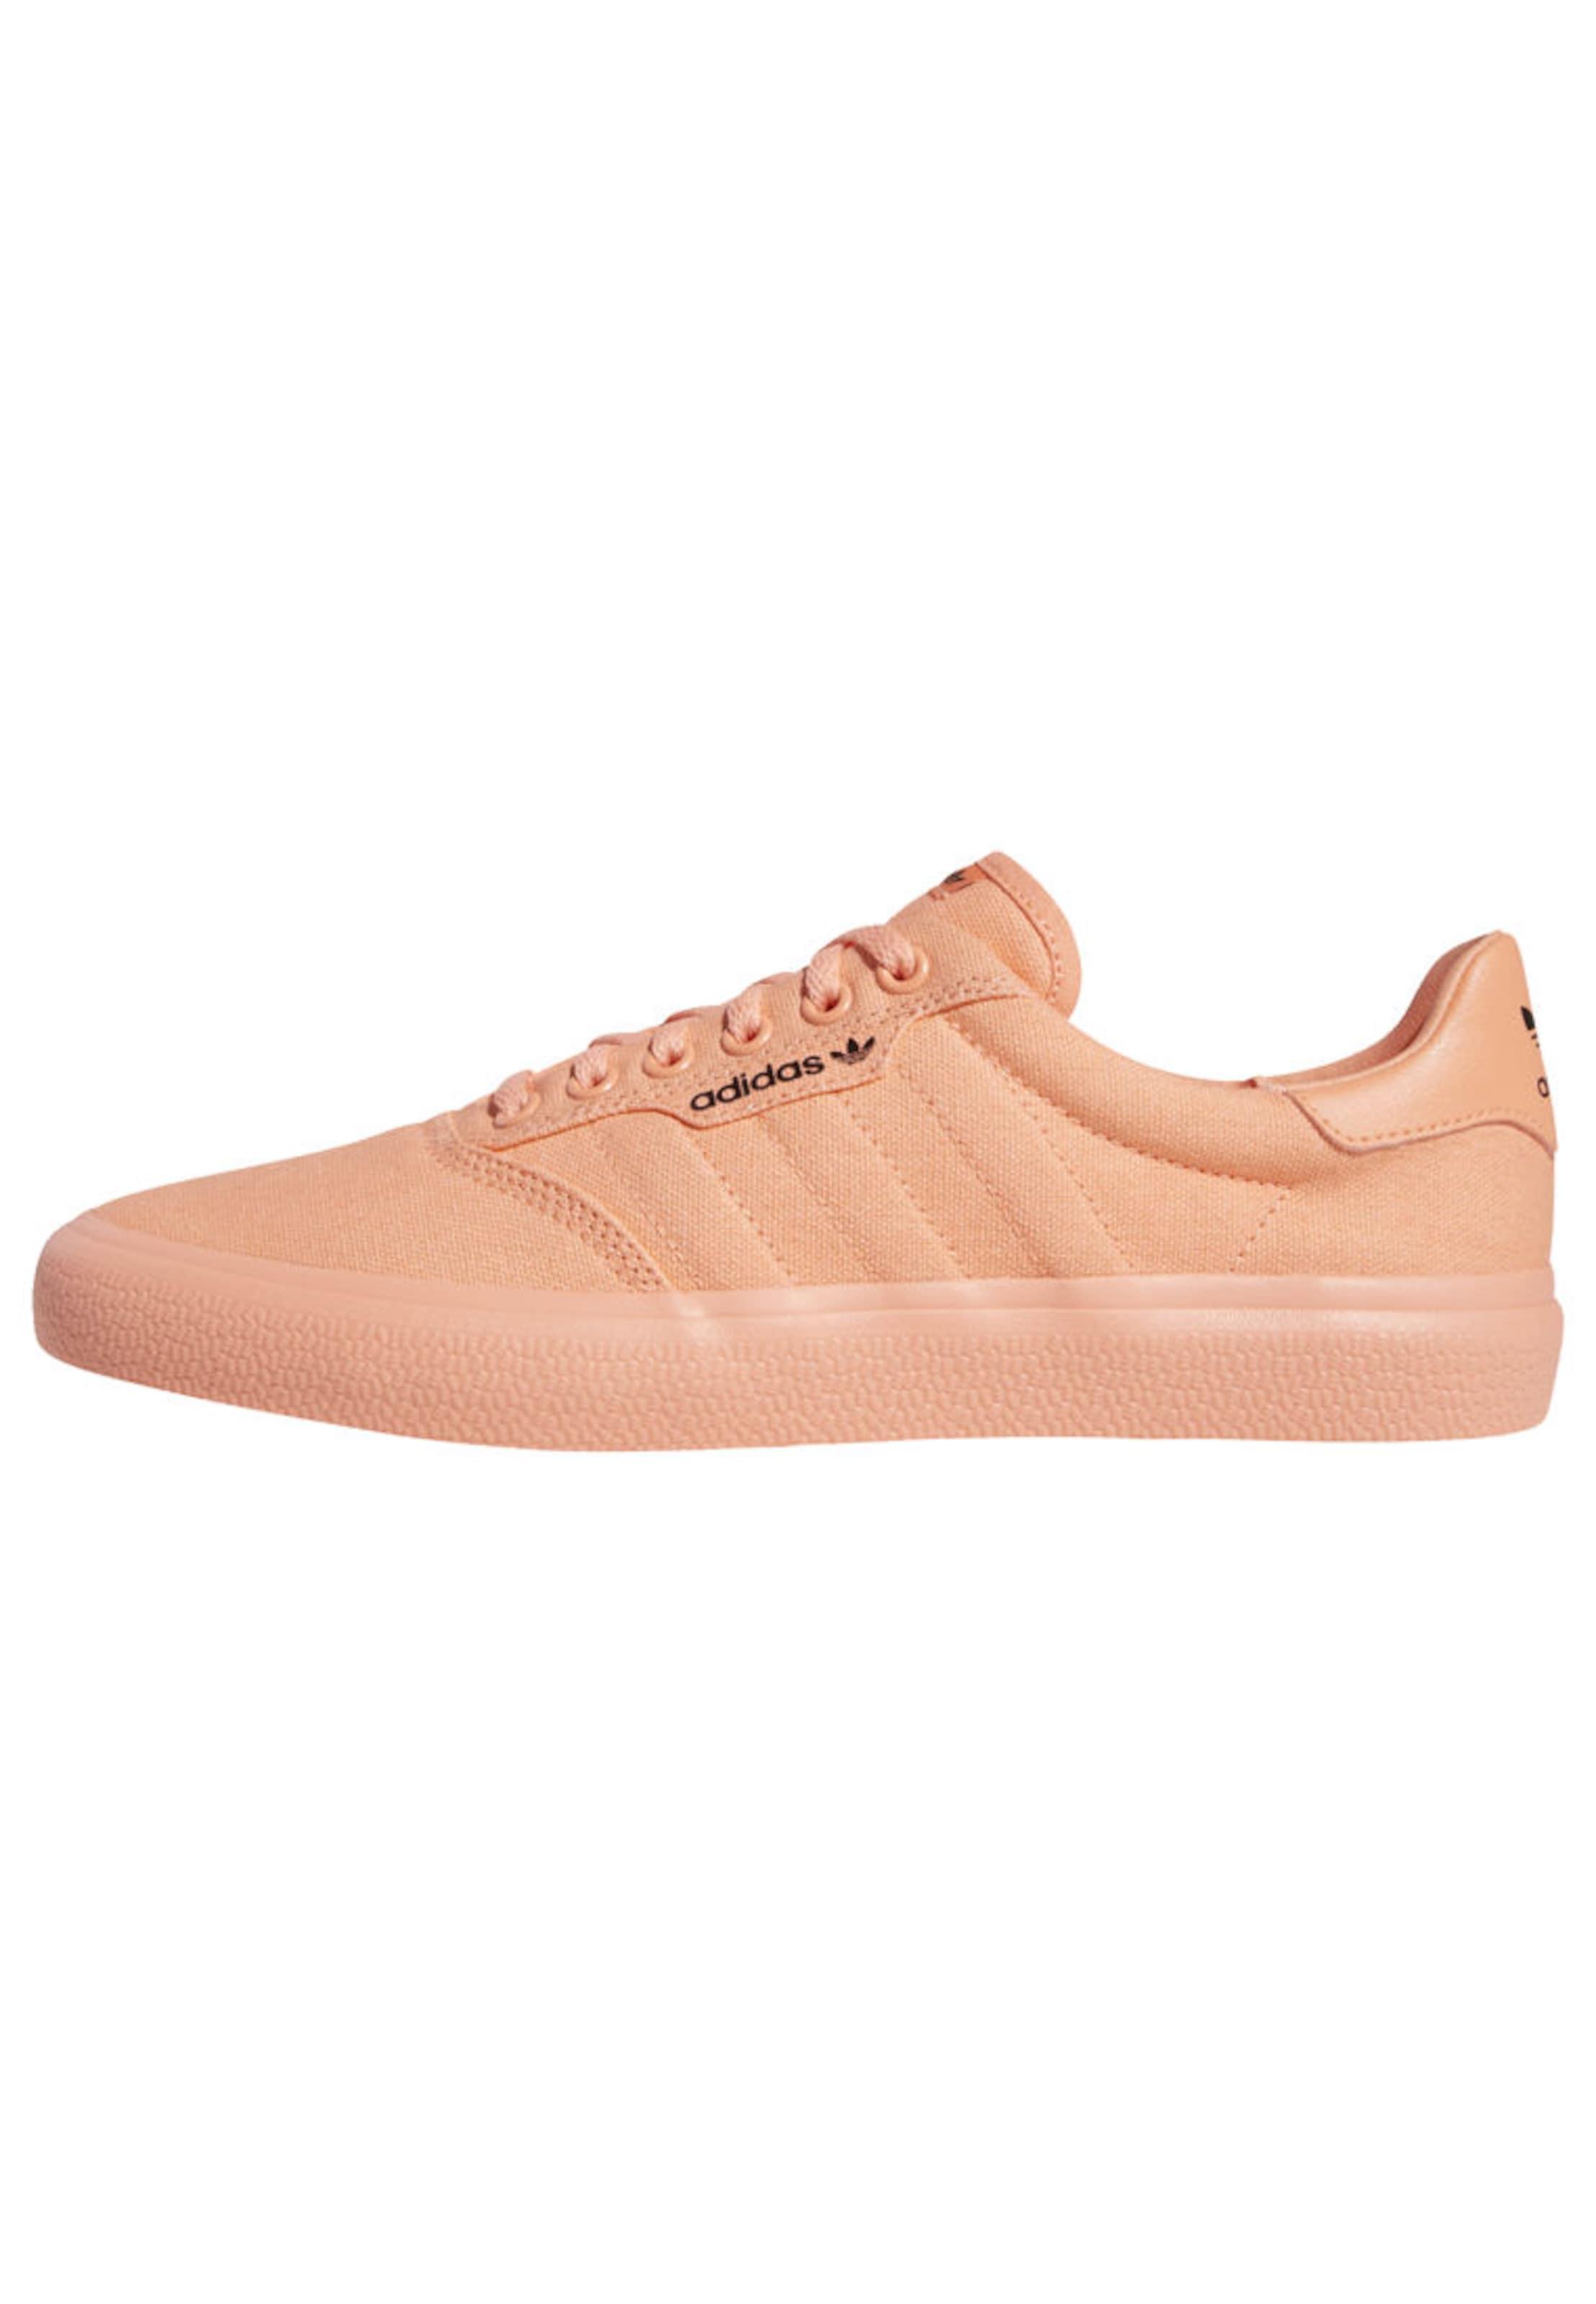 Basses '3mc' Baskets Abricot En Originals Adidas GLzMqUpSV